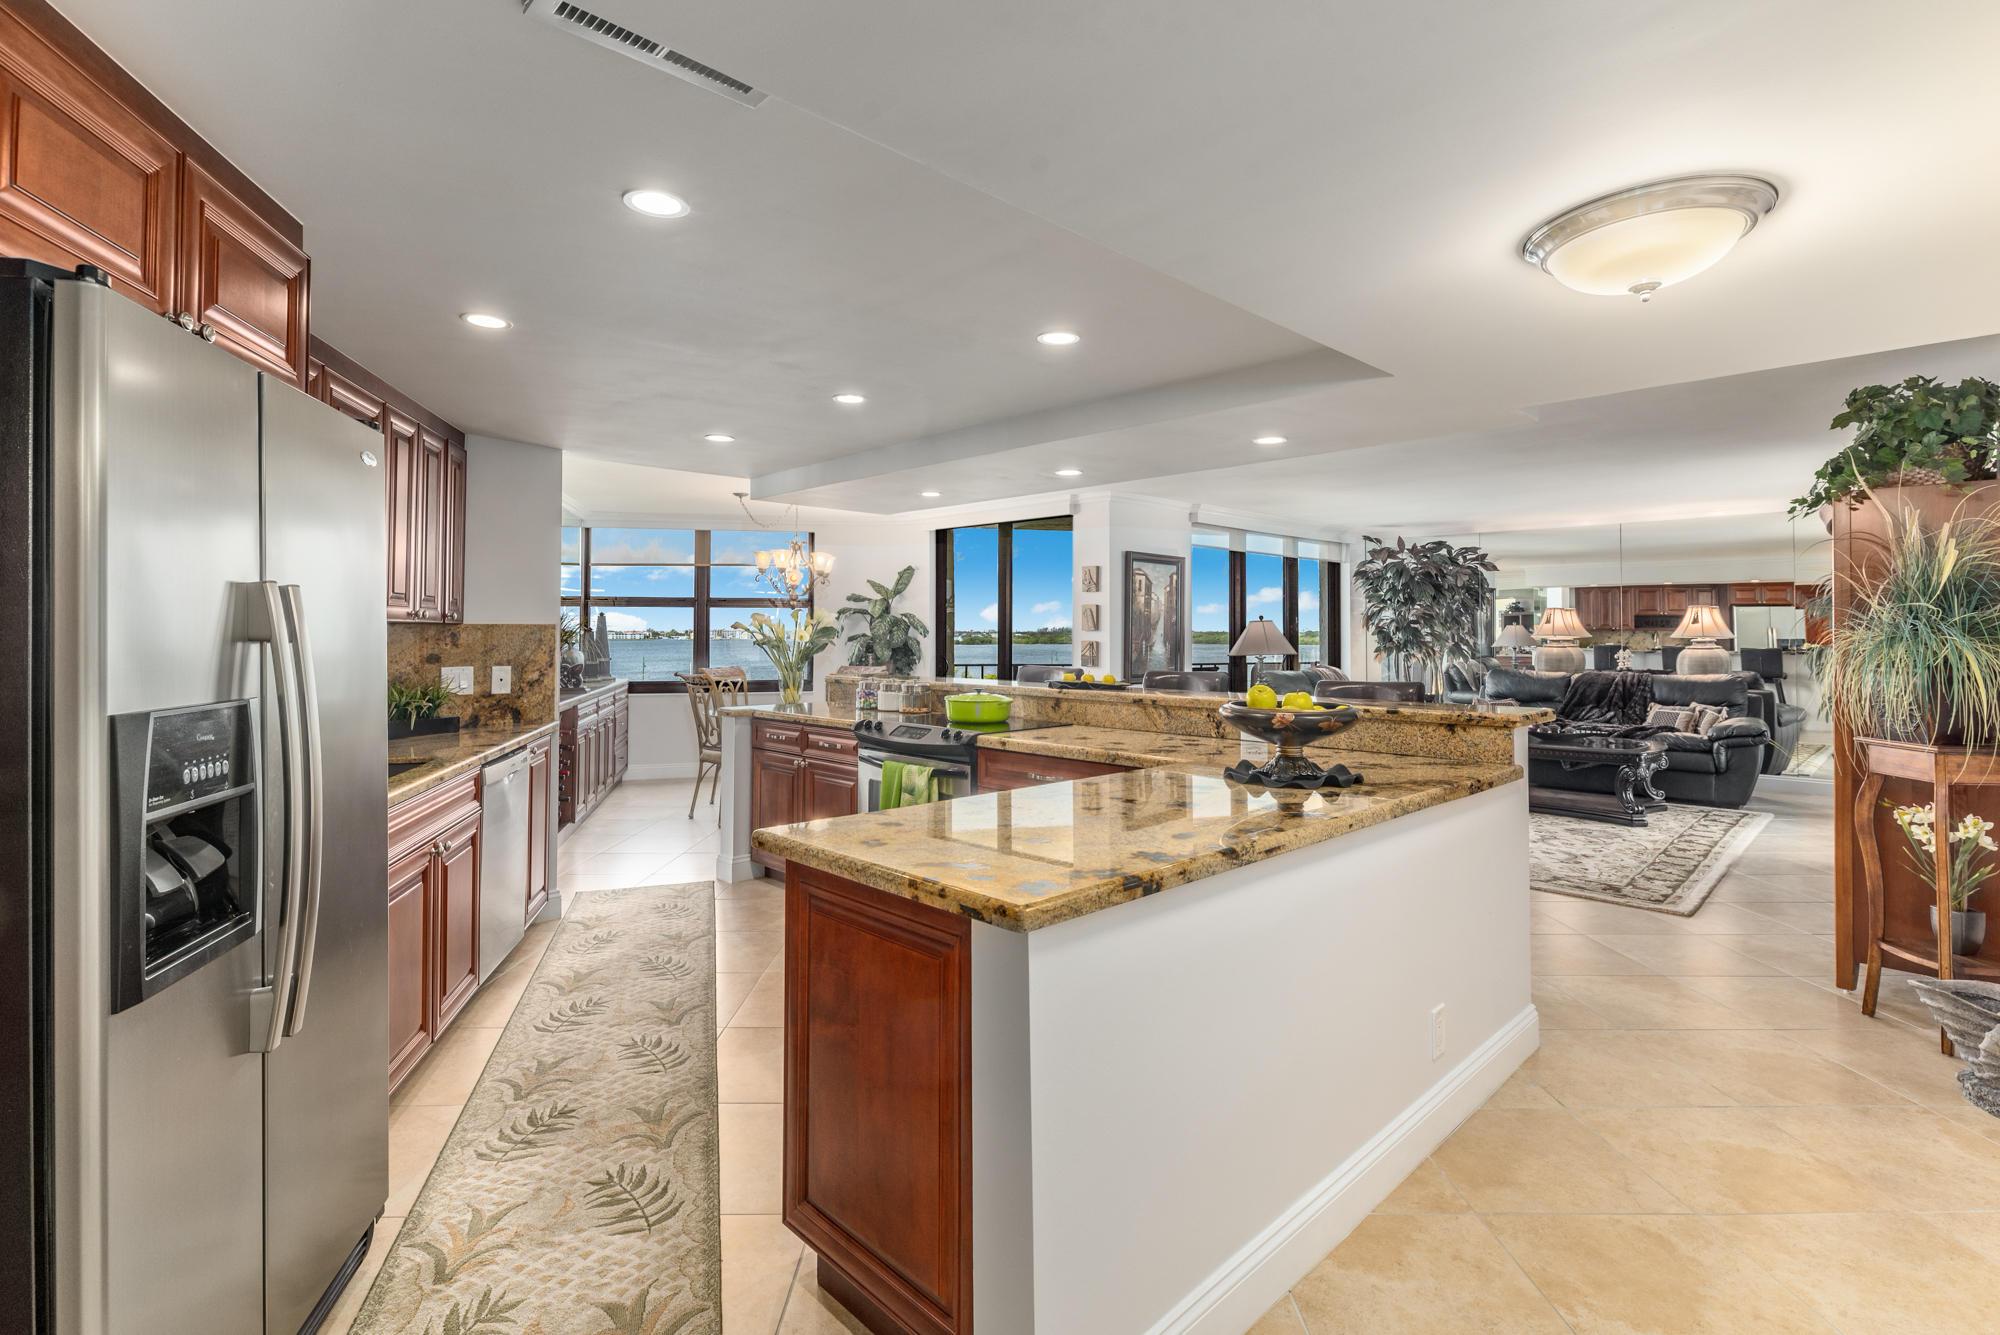 Home for sale in Connemara Riviera Beach Florida